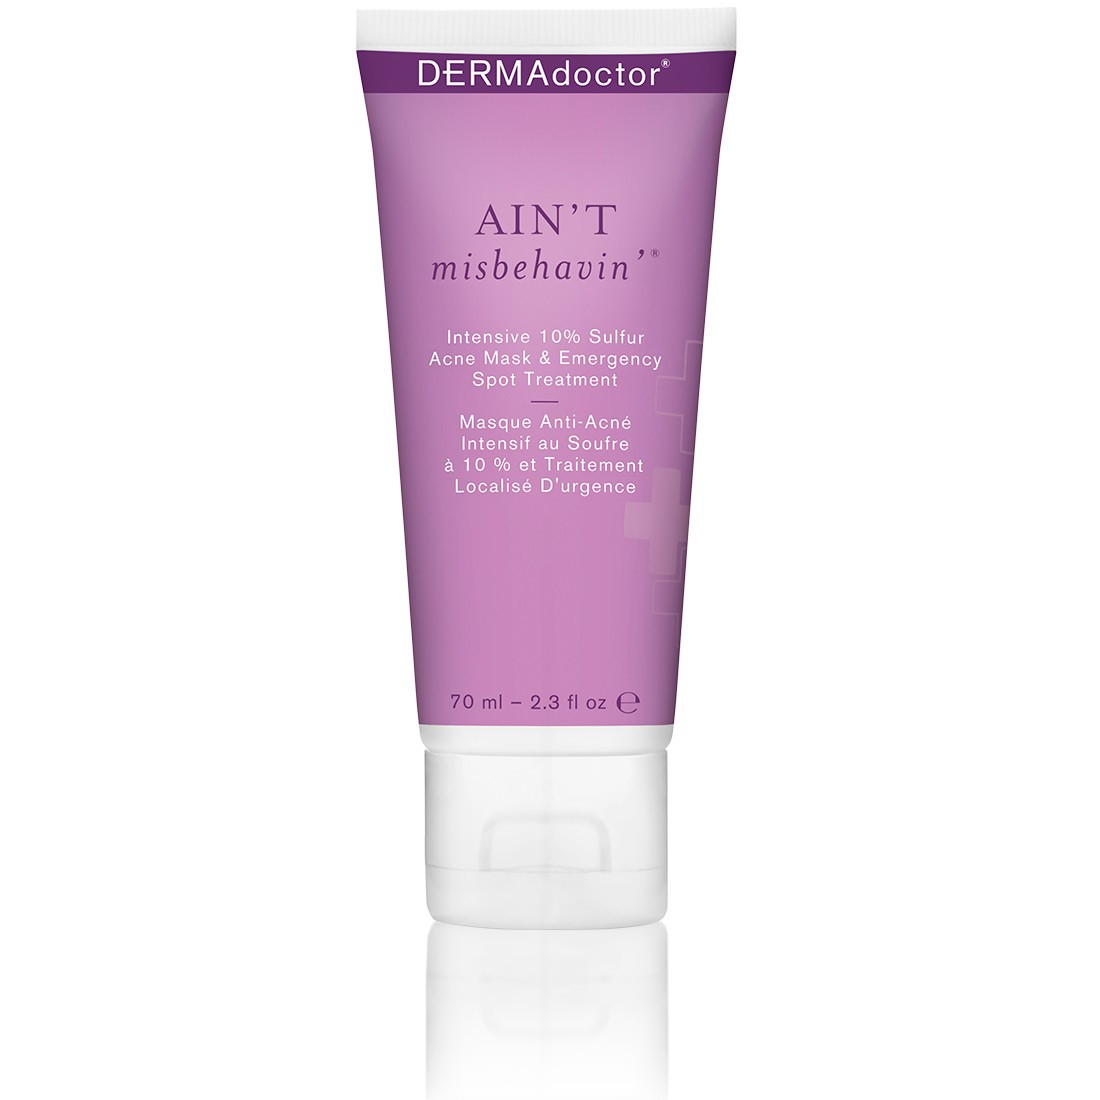 Aint Misbehavin Intensive Skin Clarifying Sulfur Acne Mask 2.3oz Gerard Cosmetics Slay All Day Setting Spray Lemongrass